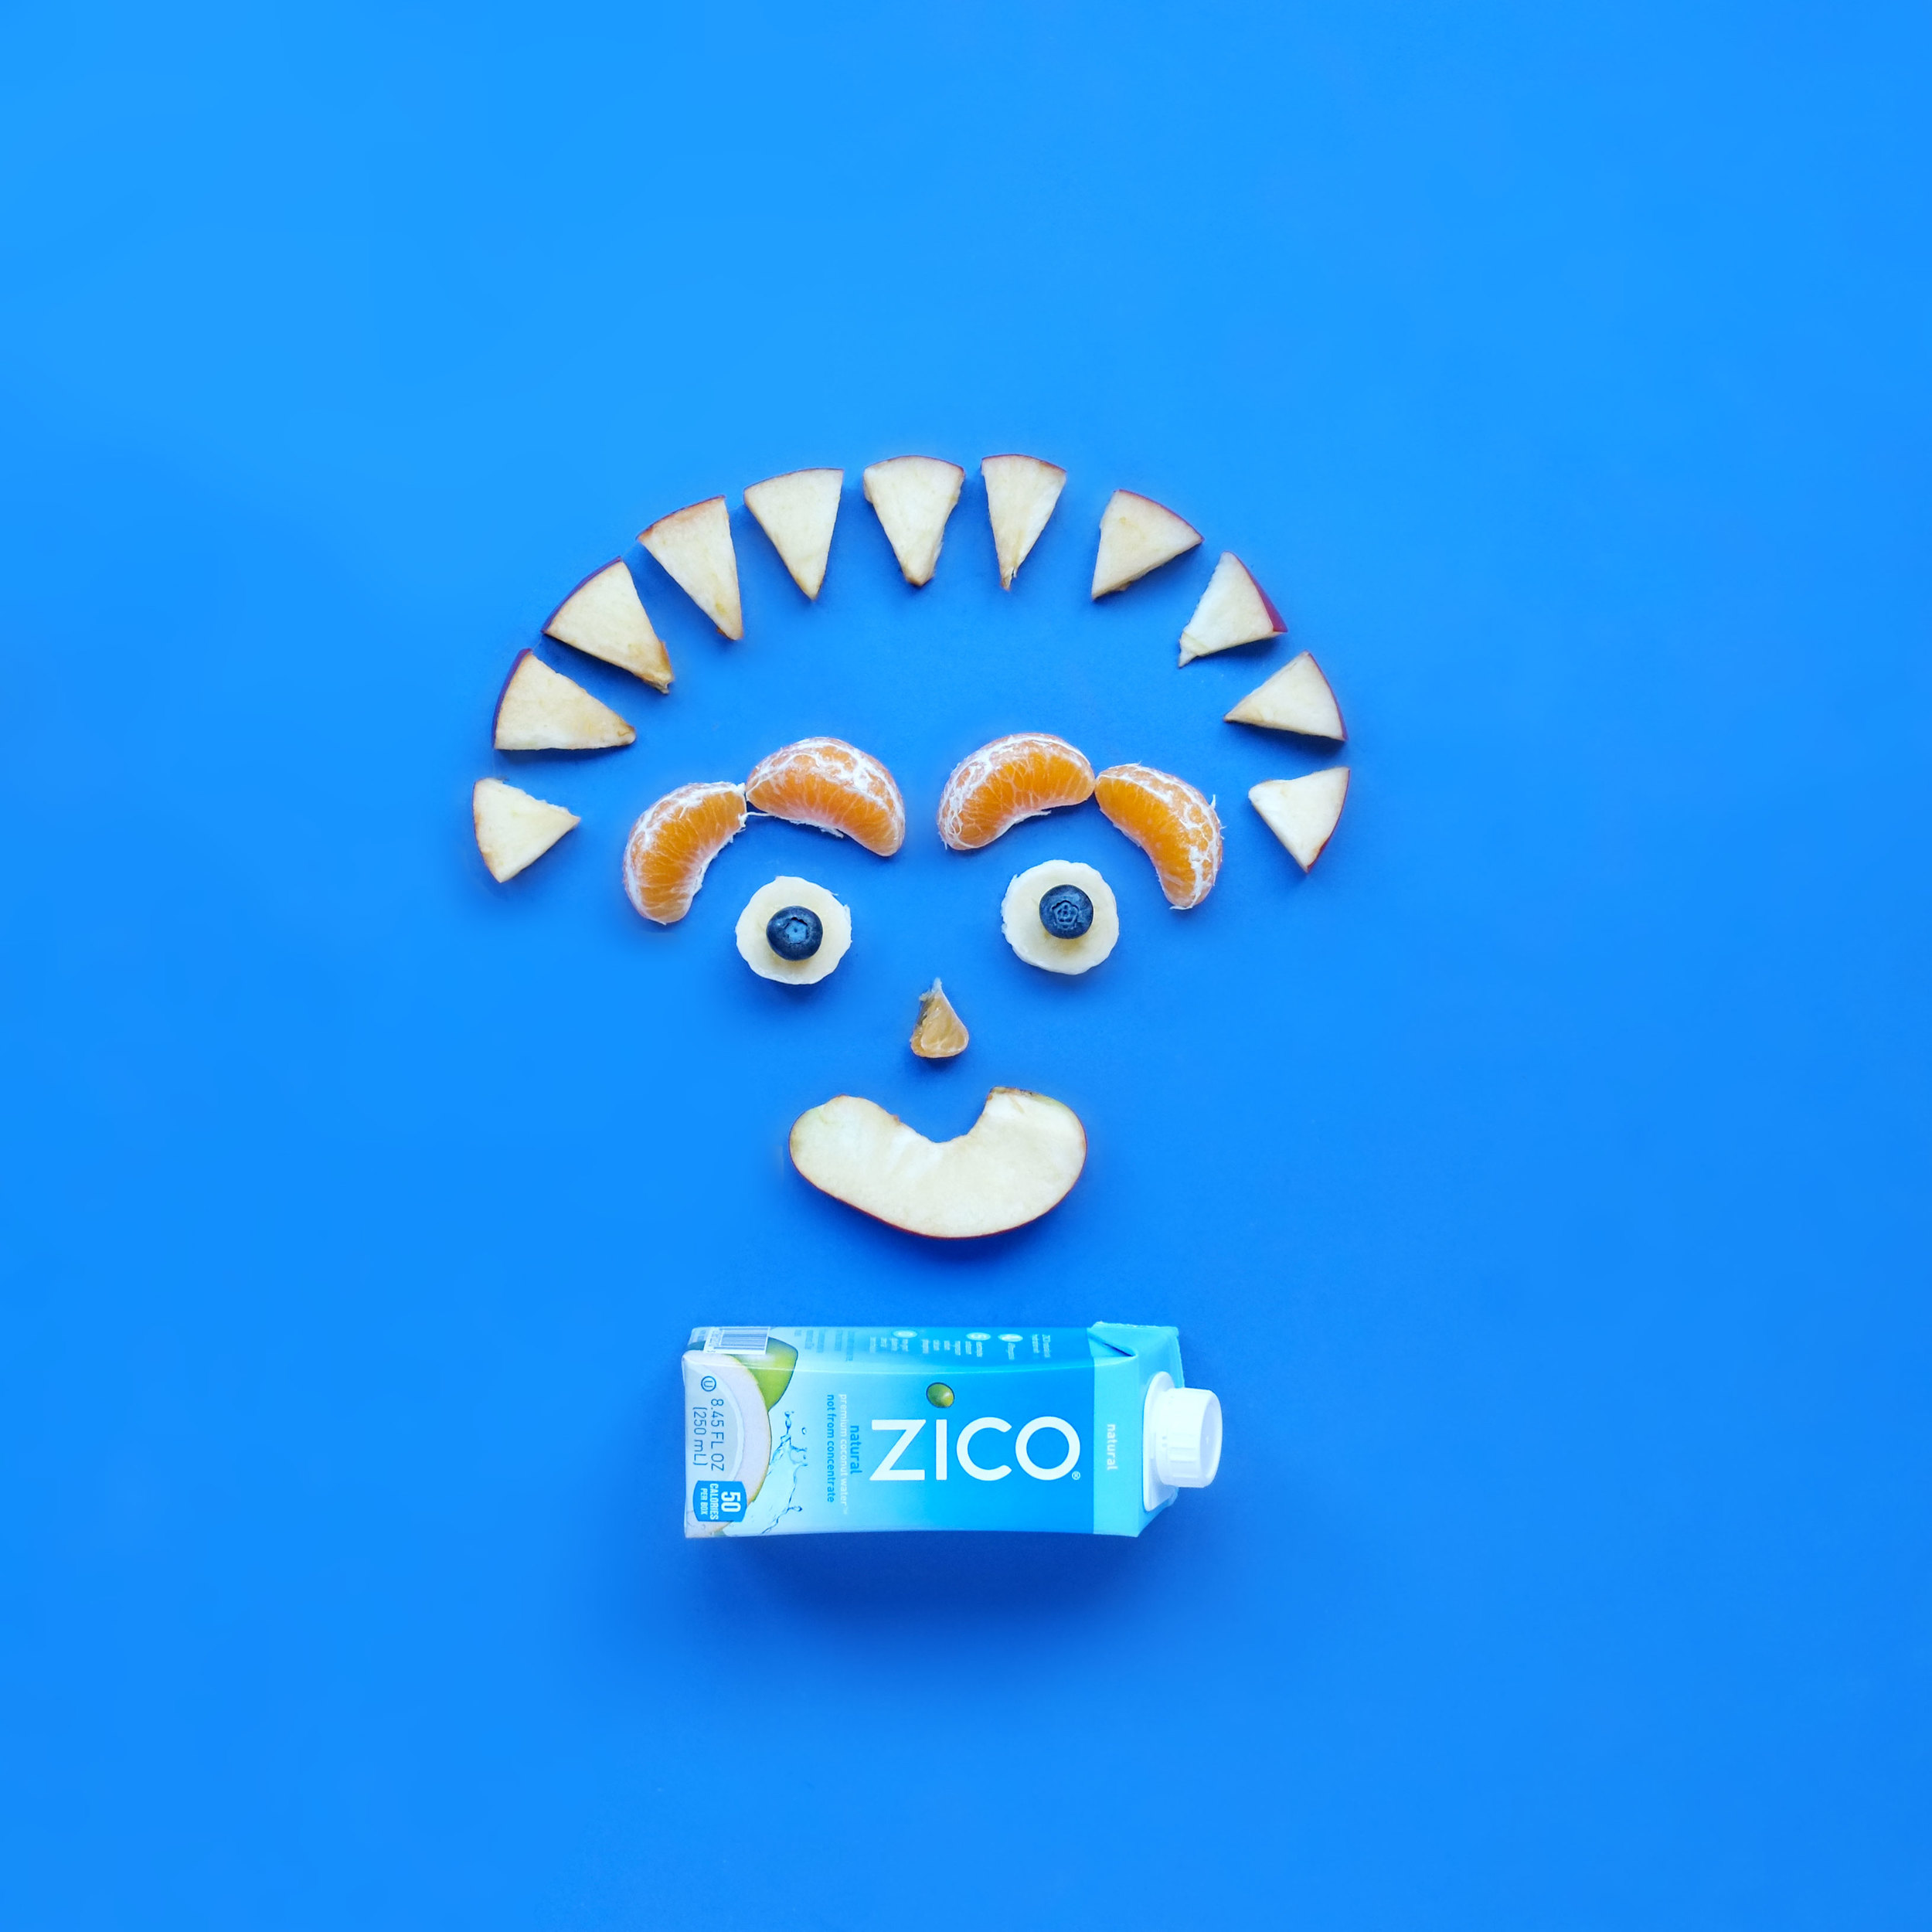 Copy of ZICO, Michelle Fidman